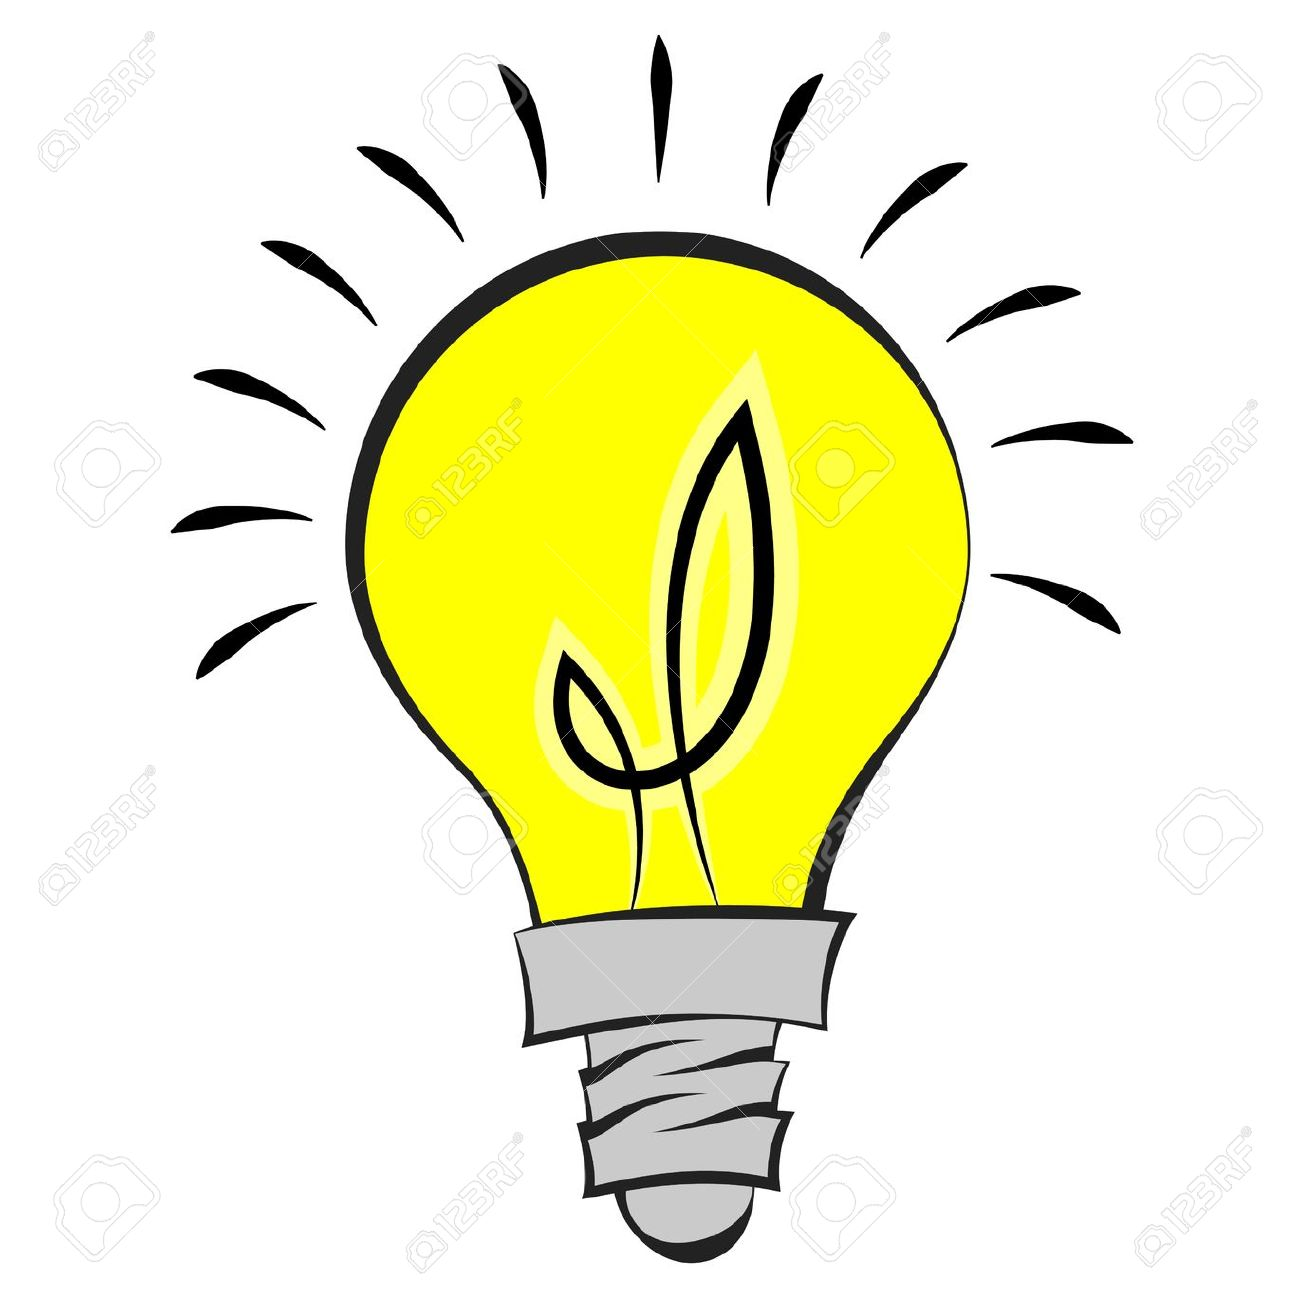 Clipart Light Bulb-clipart light bulb-1